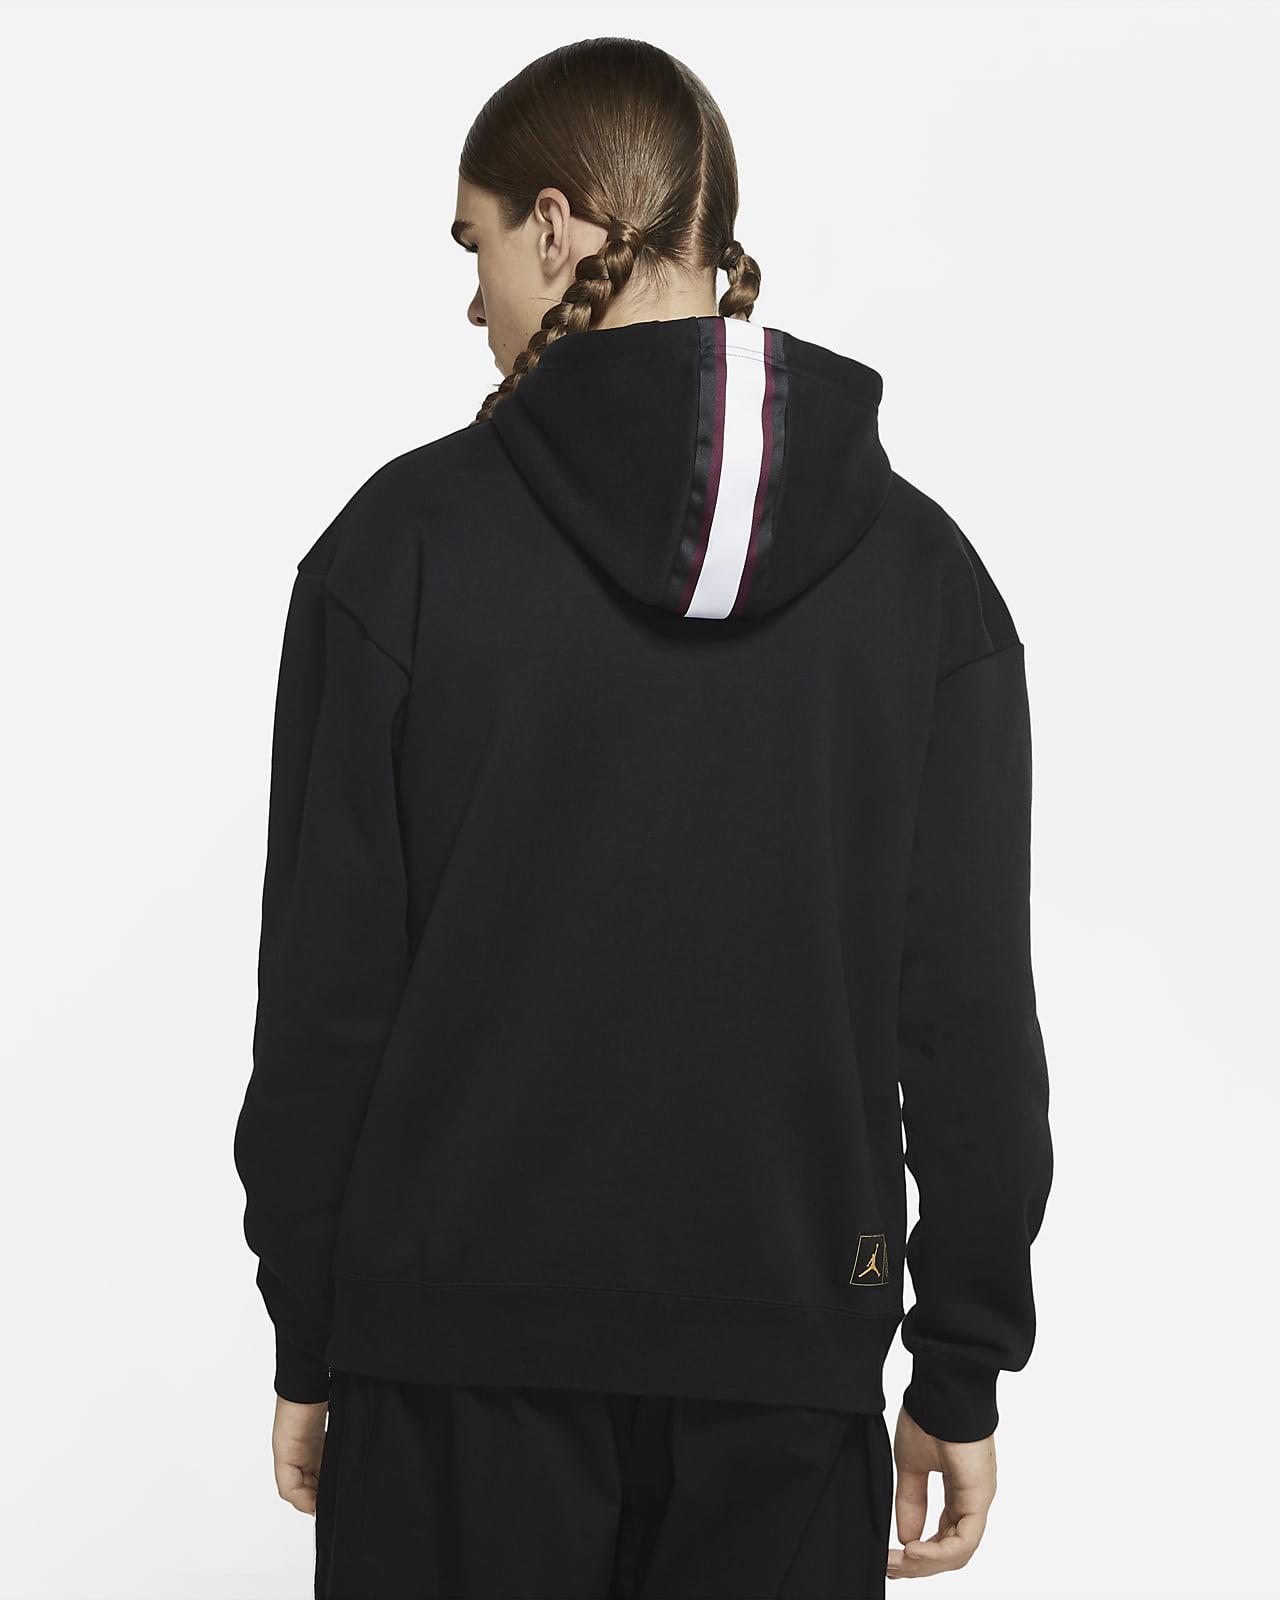 carpintero innovación Proverbio  Paris Saint-Germain Men's Taped Pullover Hoodie. Nike.com